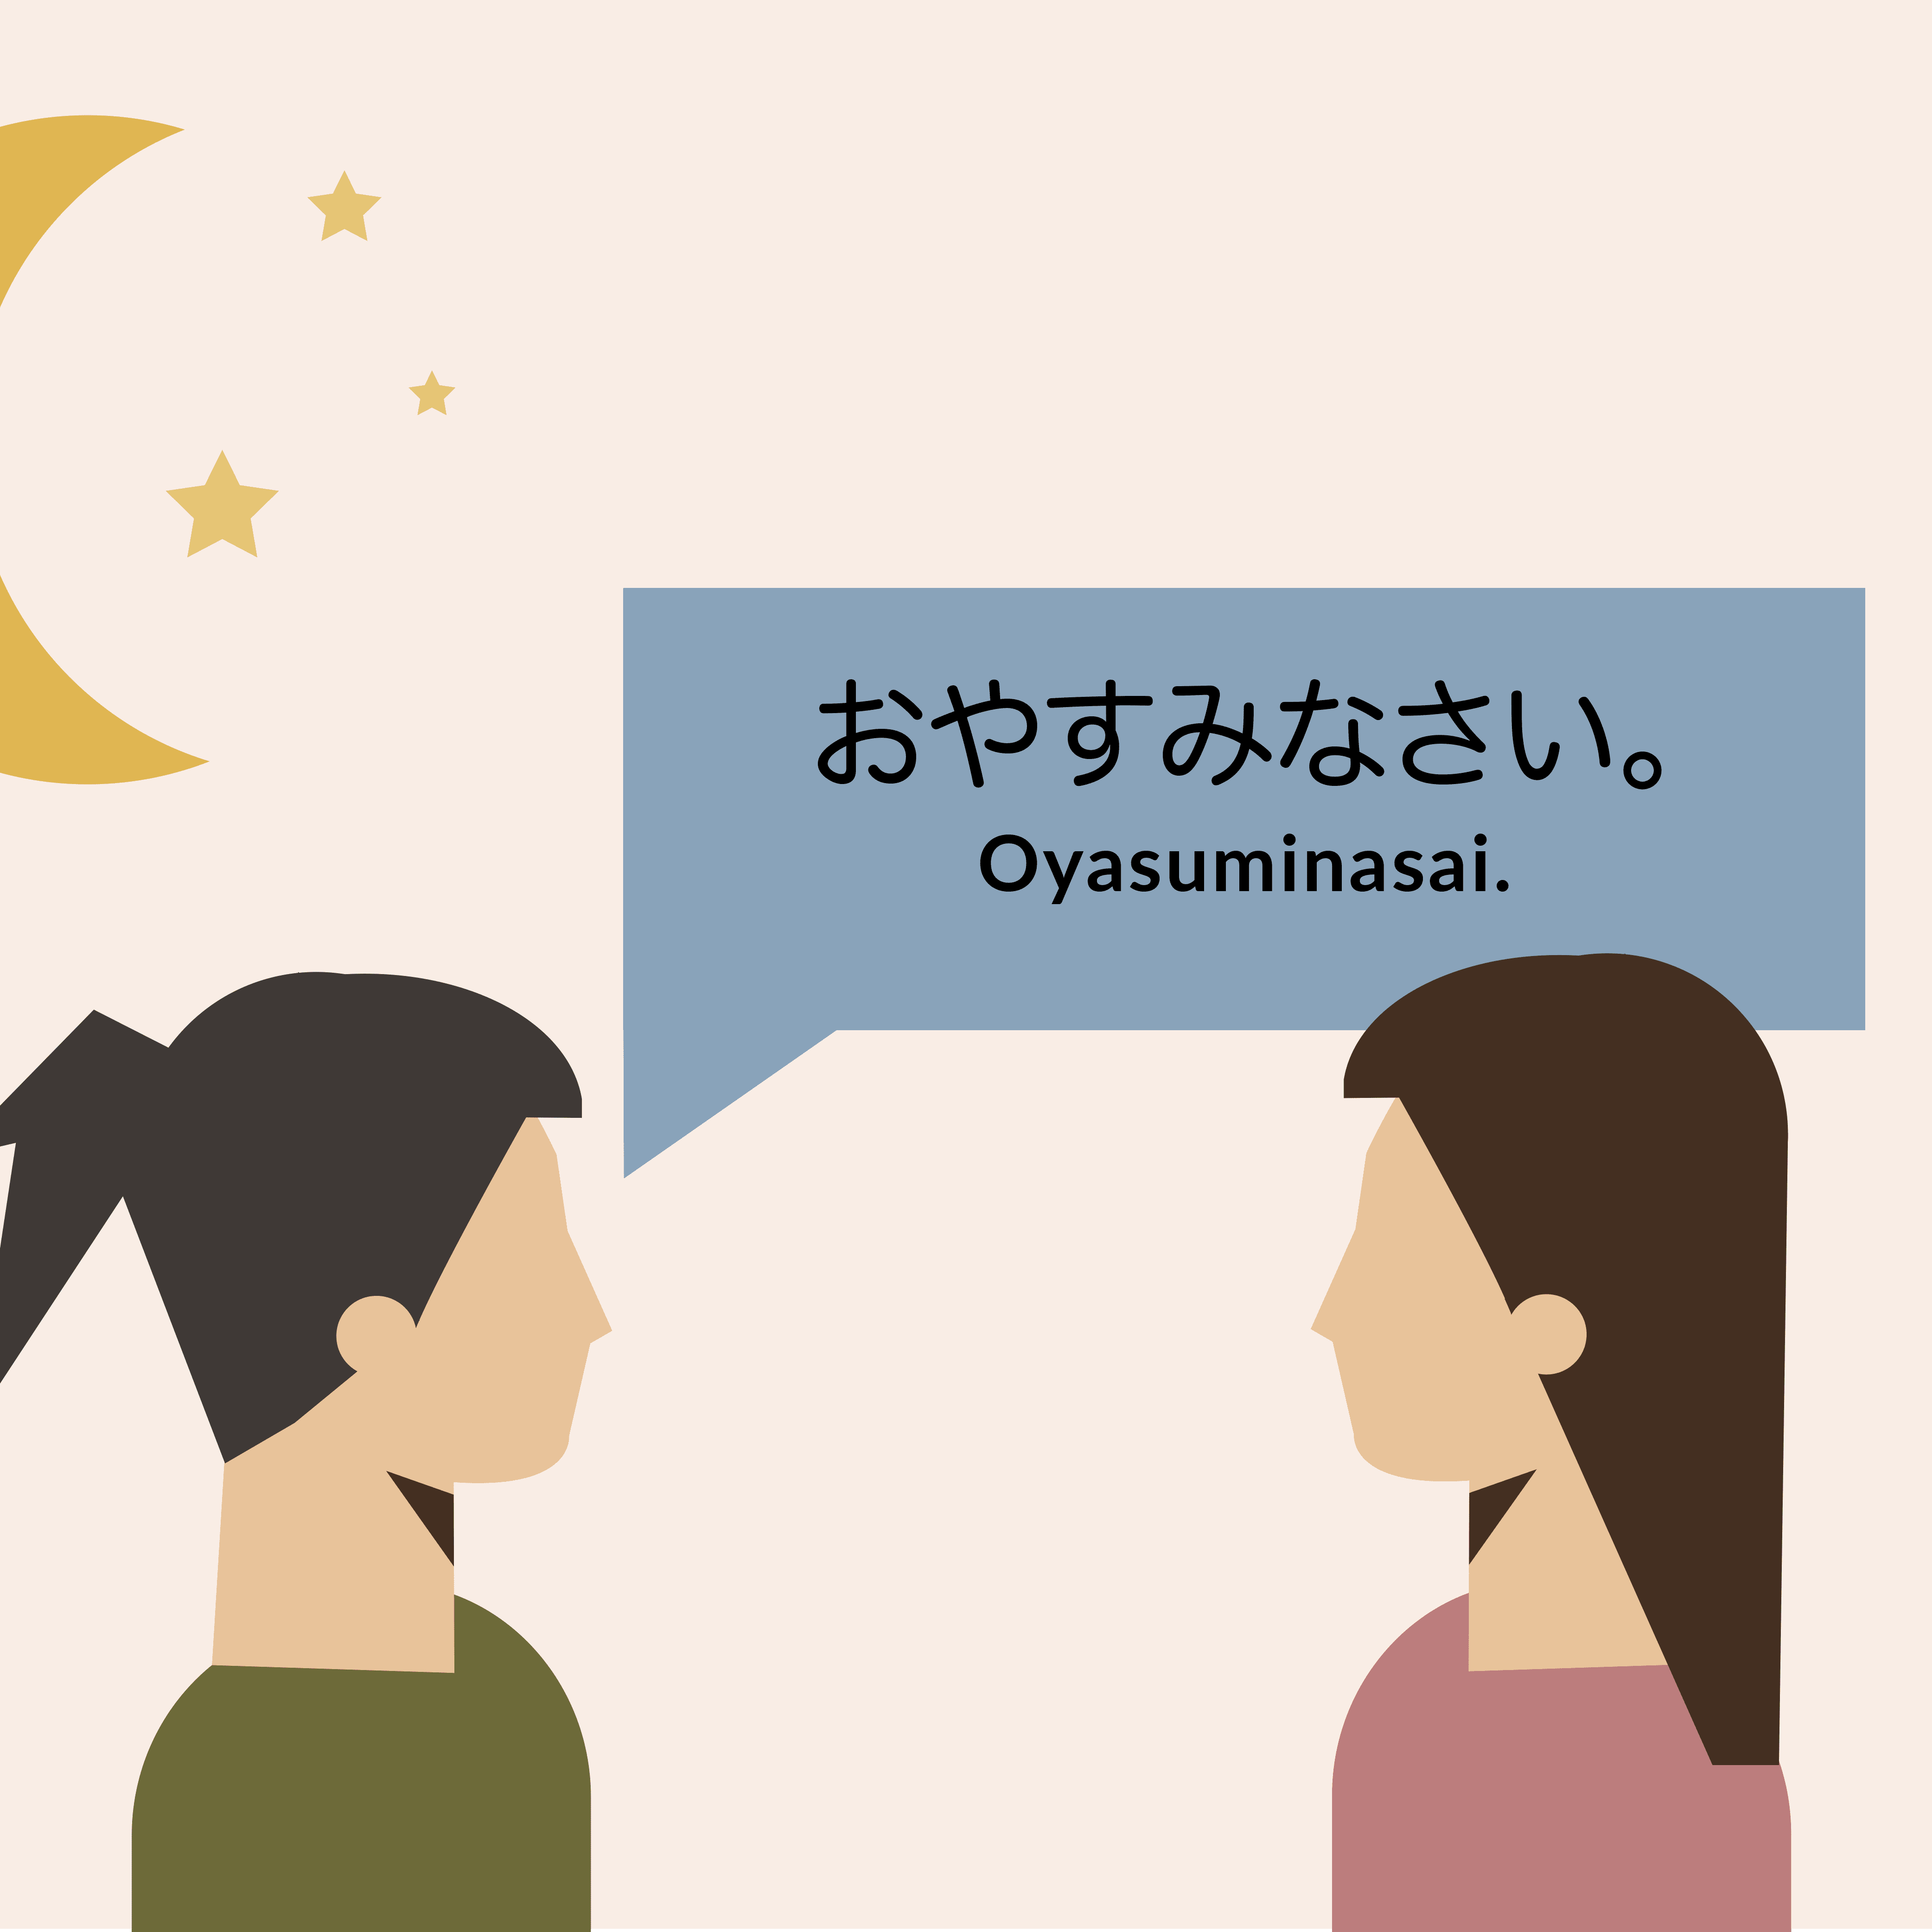 How to Say Good Night (Oyasuminasai) in Japanese